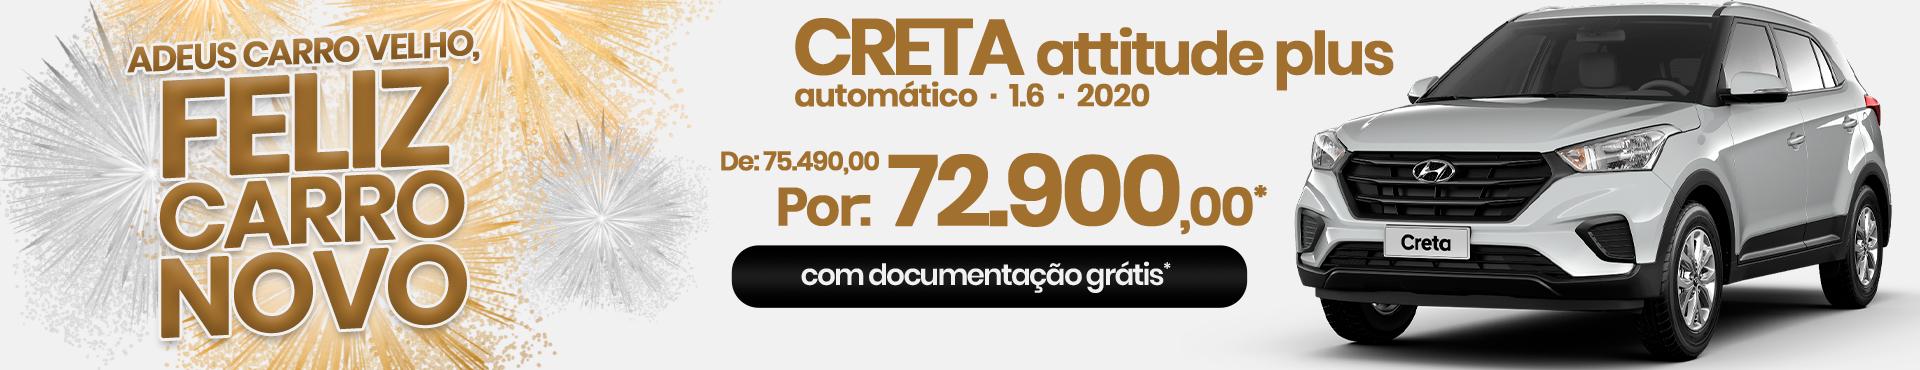 Creta Attitude Automático